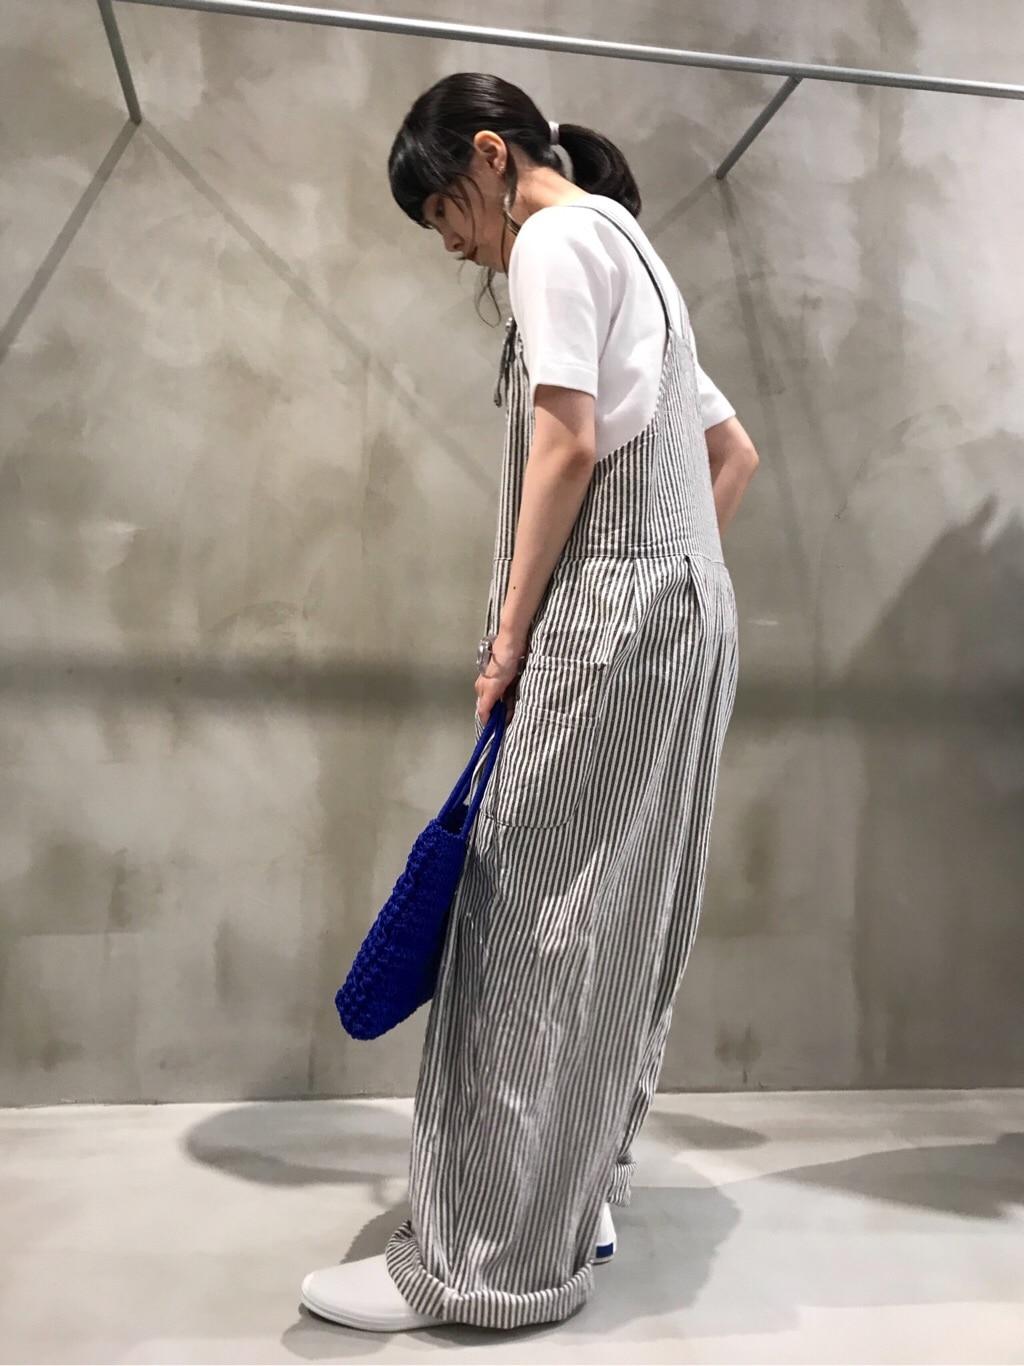 bulle de savon 渋谷スクランブルスクエア 身長:153cm 2020.06.09